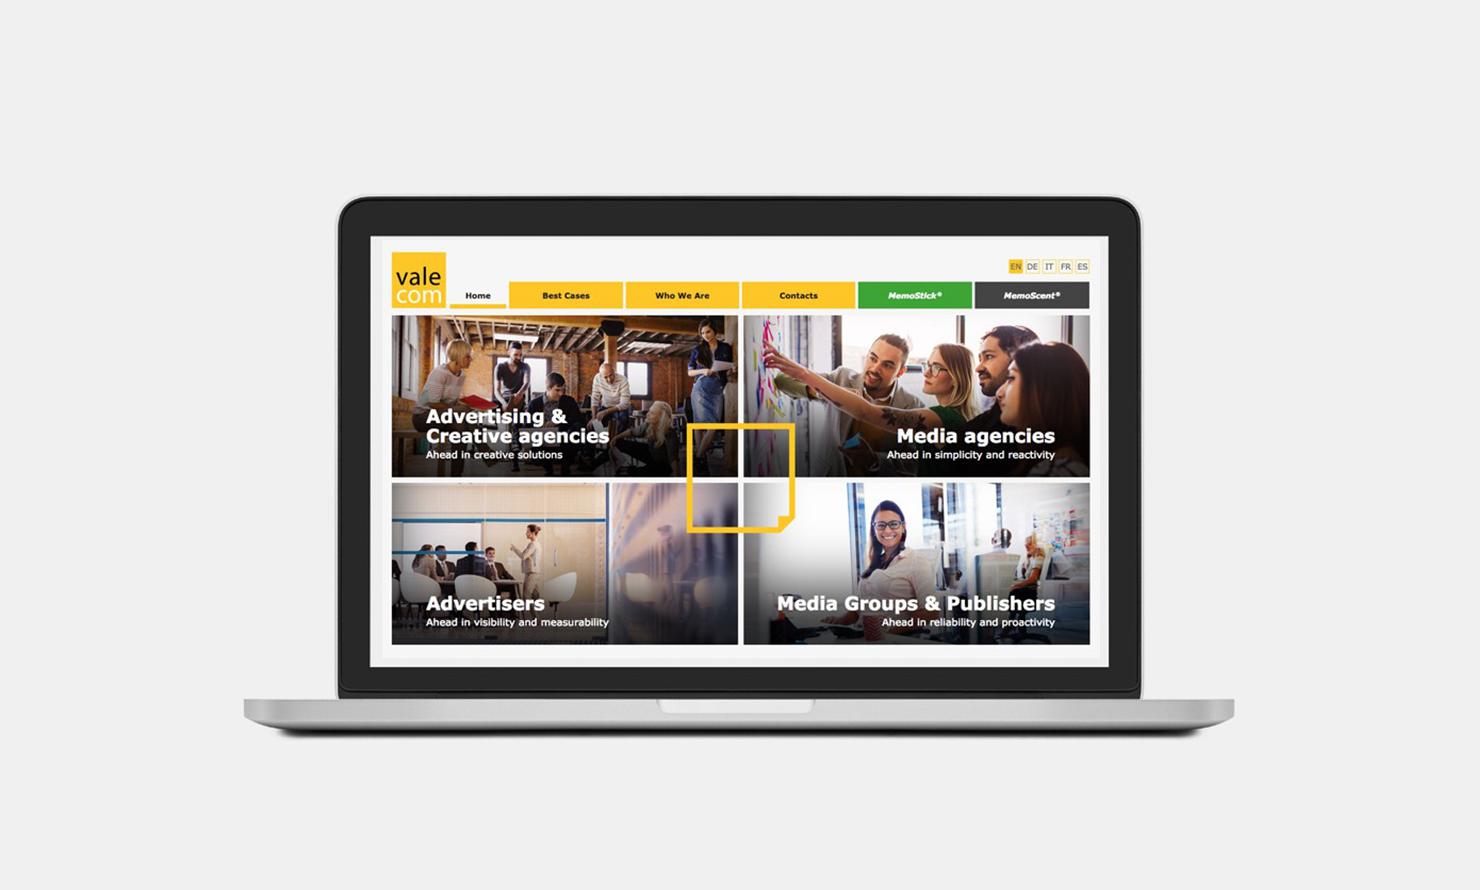 https://www.kubelibre.com/uploads/Slider-work-tutti-clienti/valecom-memostick-sito-web-1.jpg